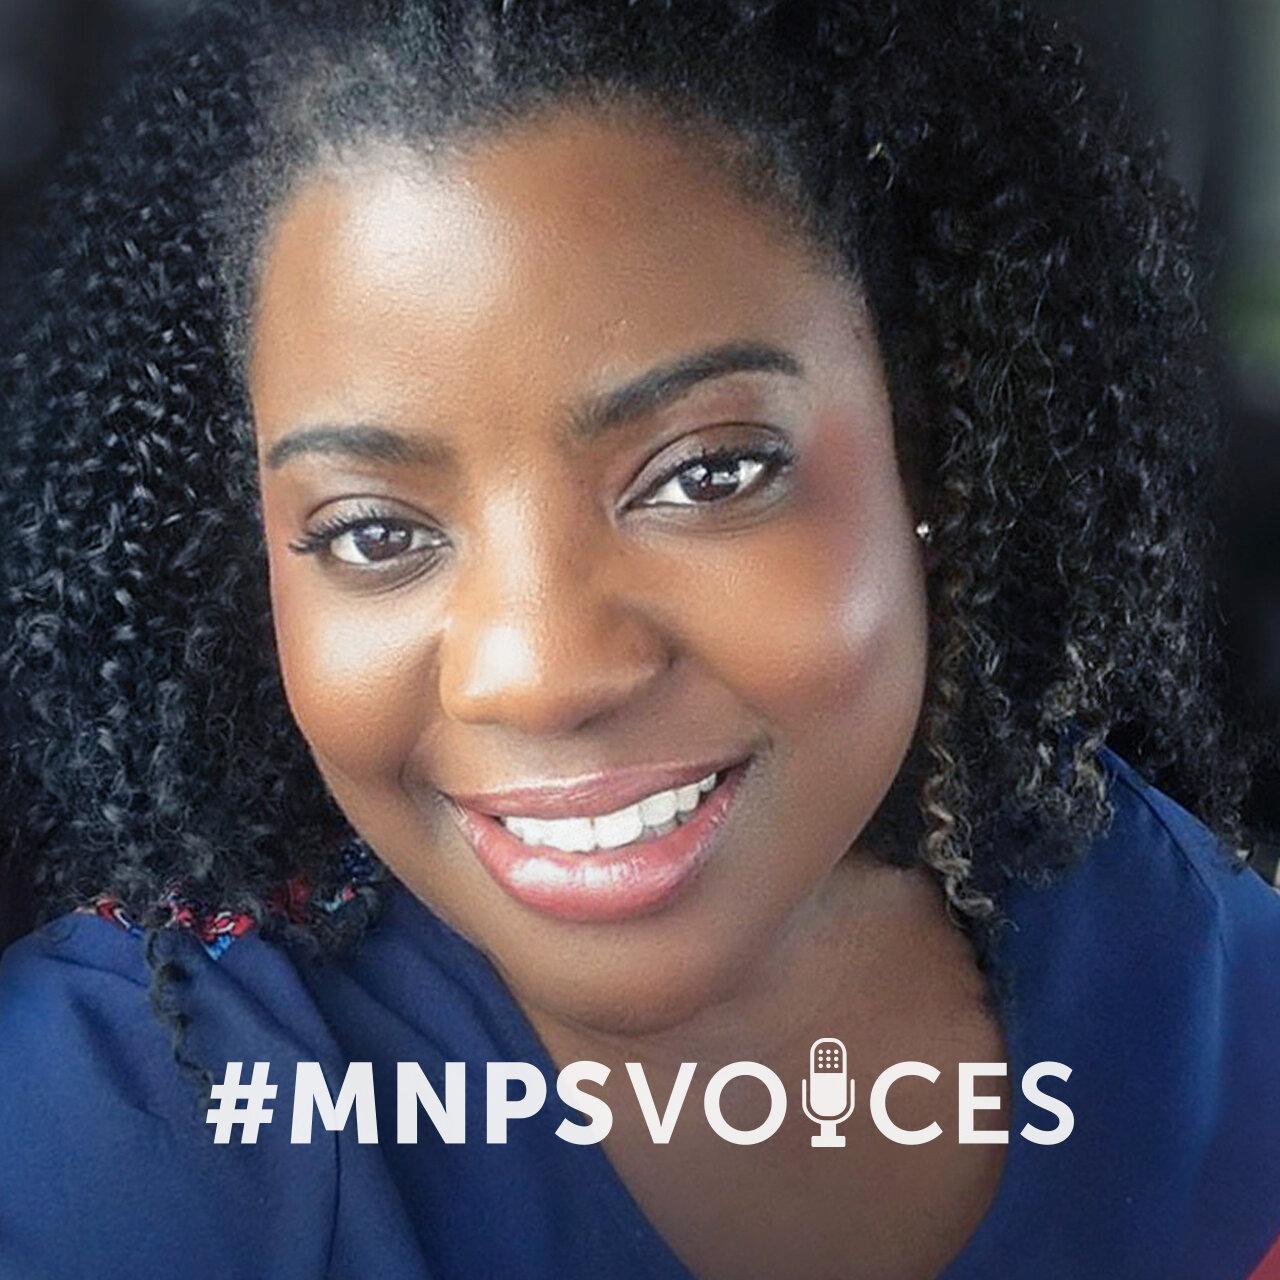 MNPSVoices_111020_NicoleValentine.jpg